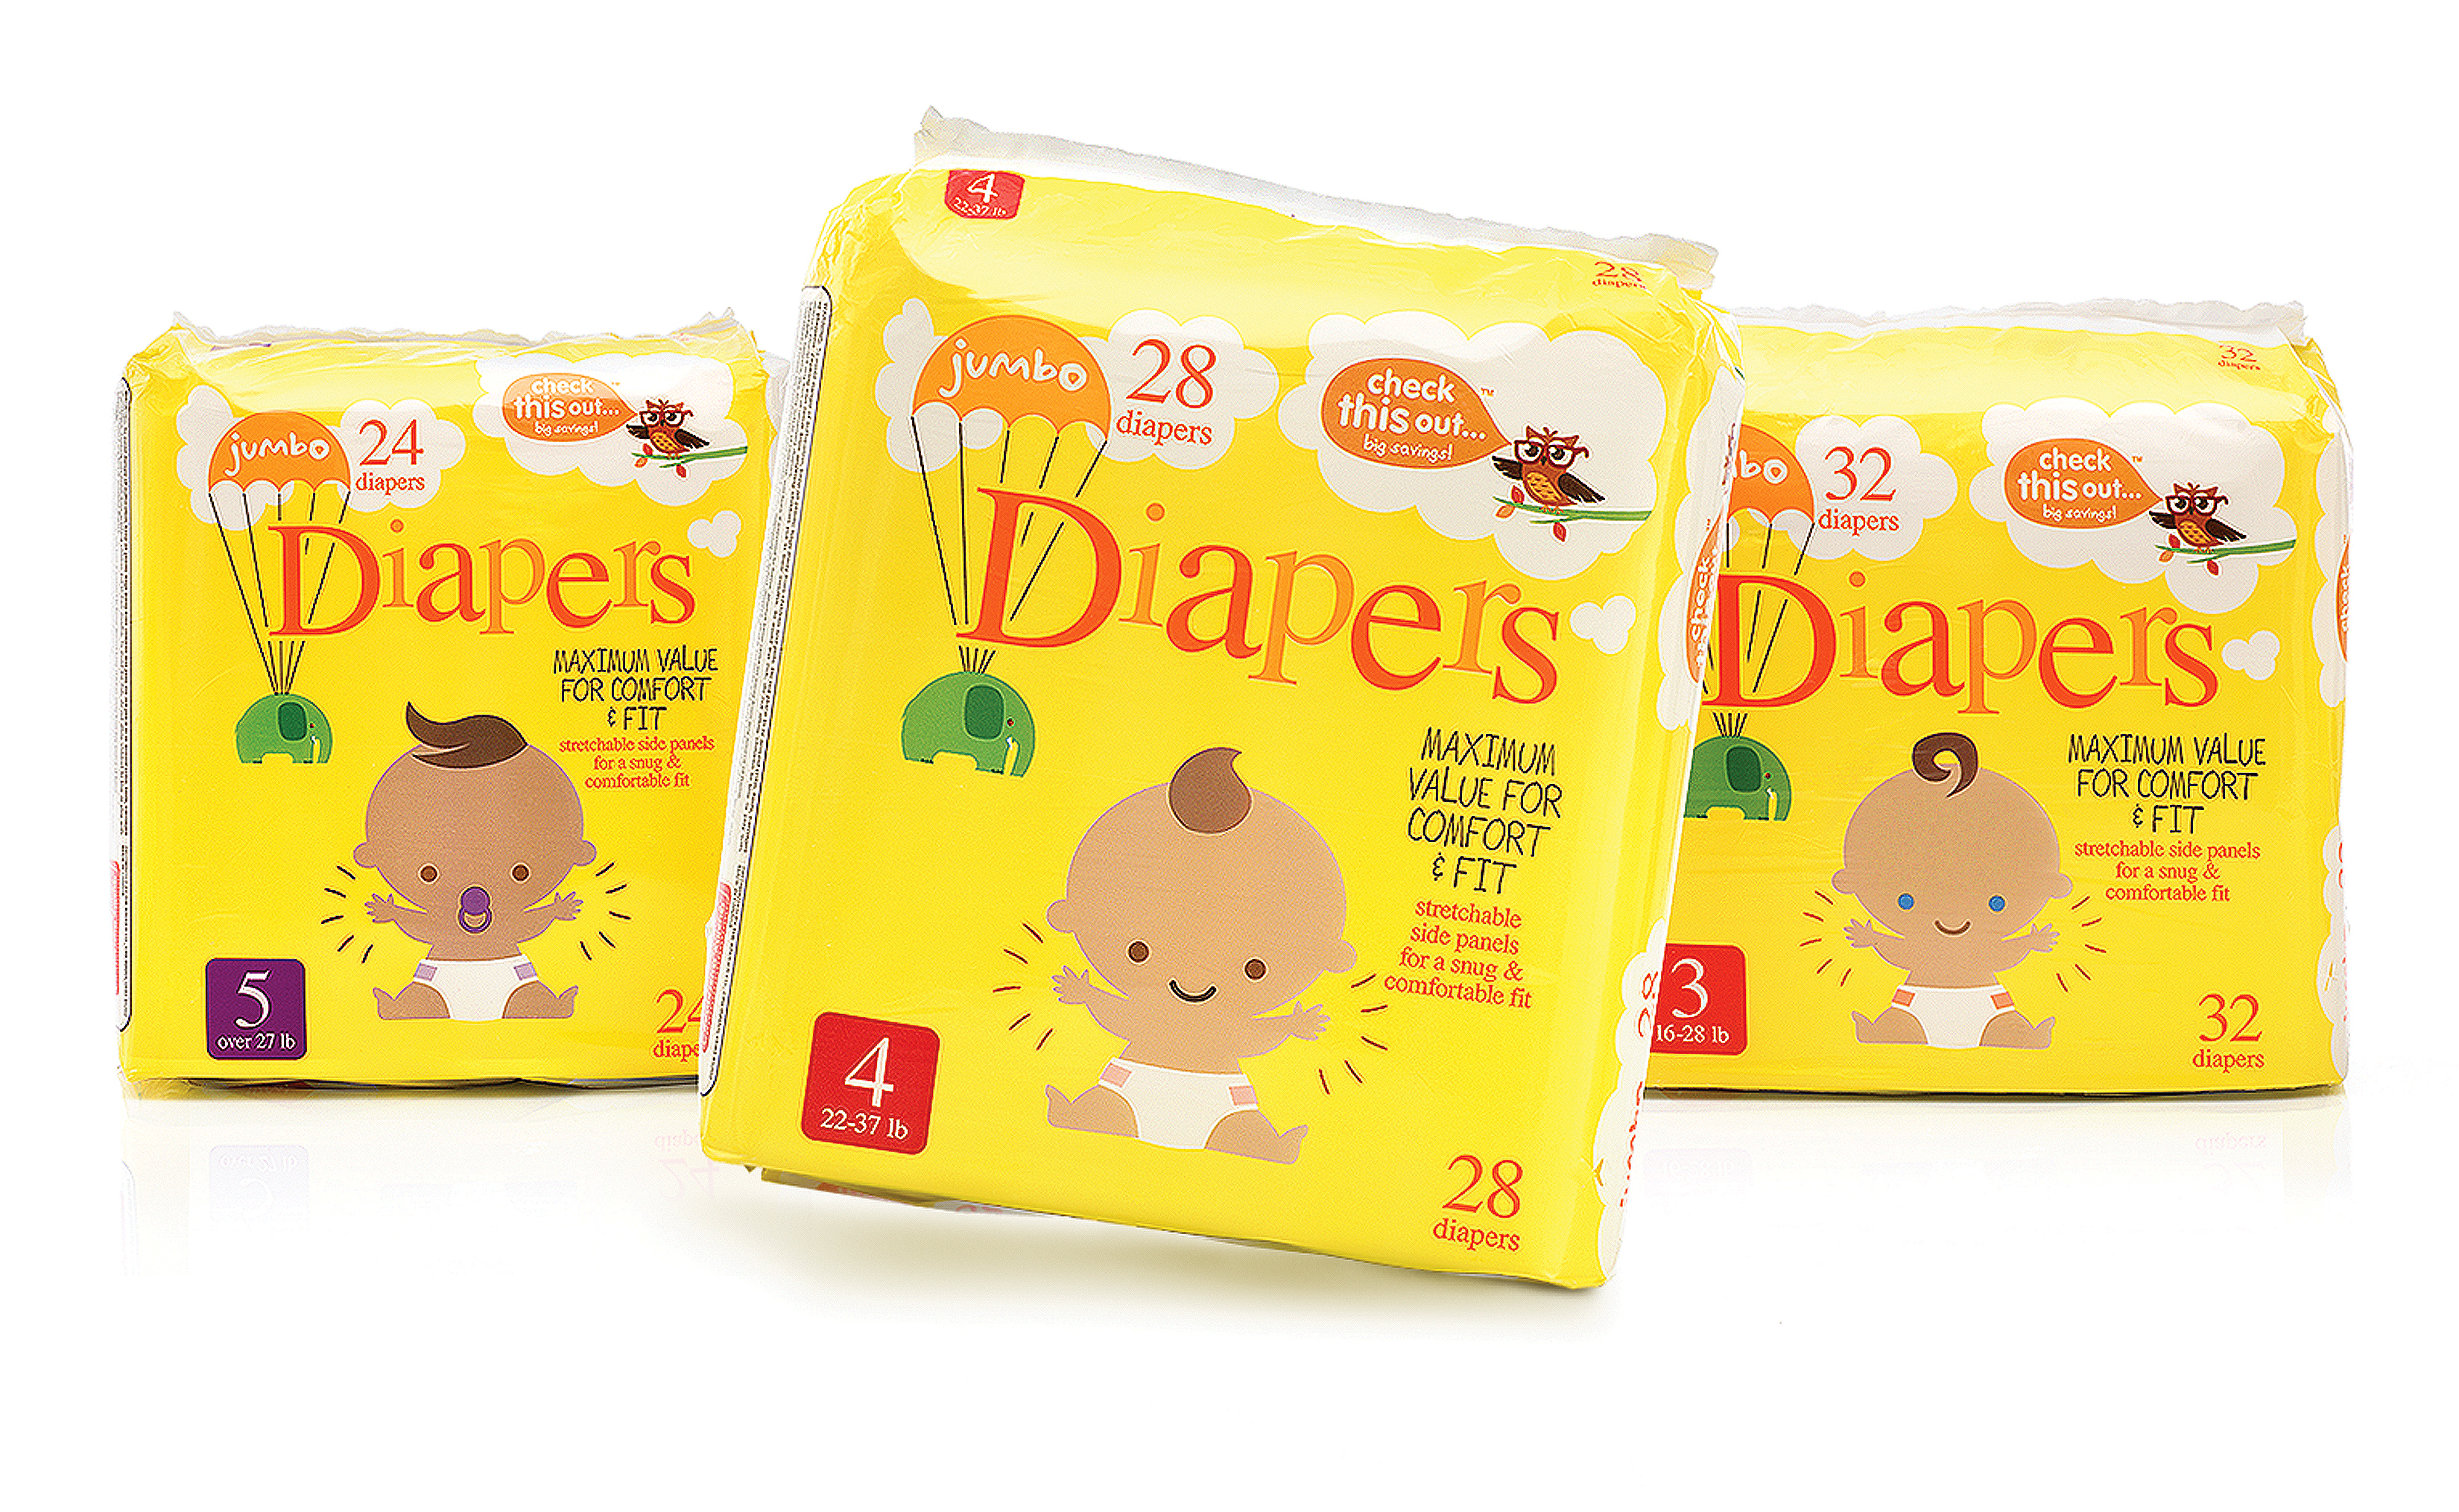 Kroger value diapers.jpg